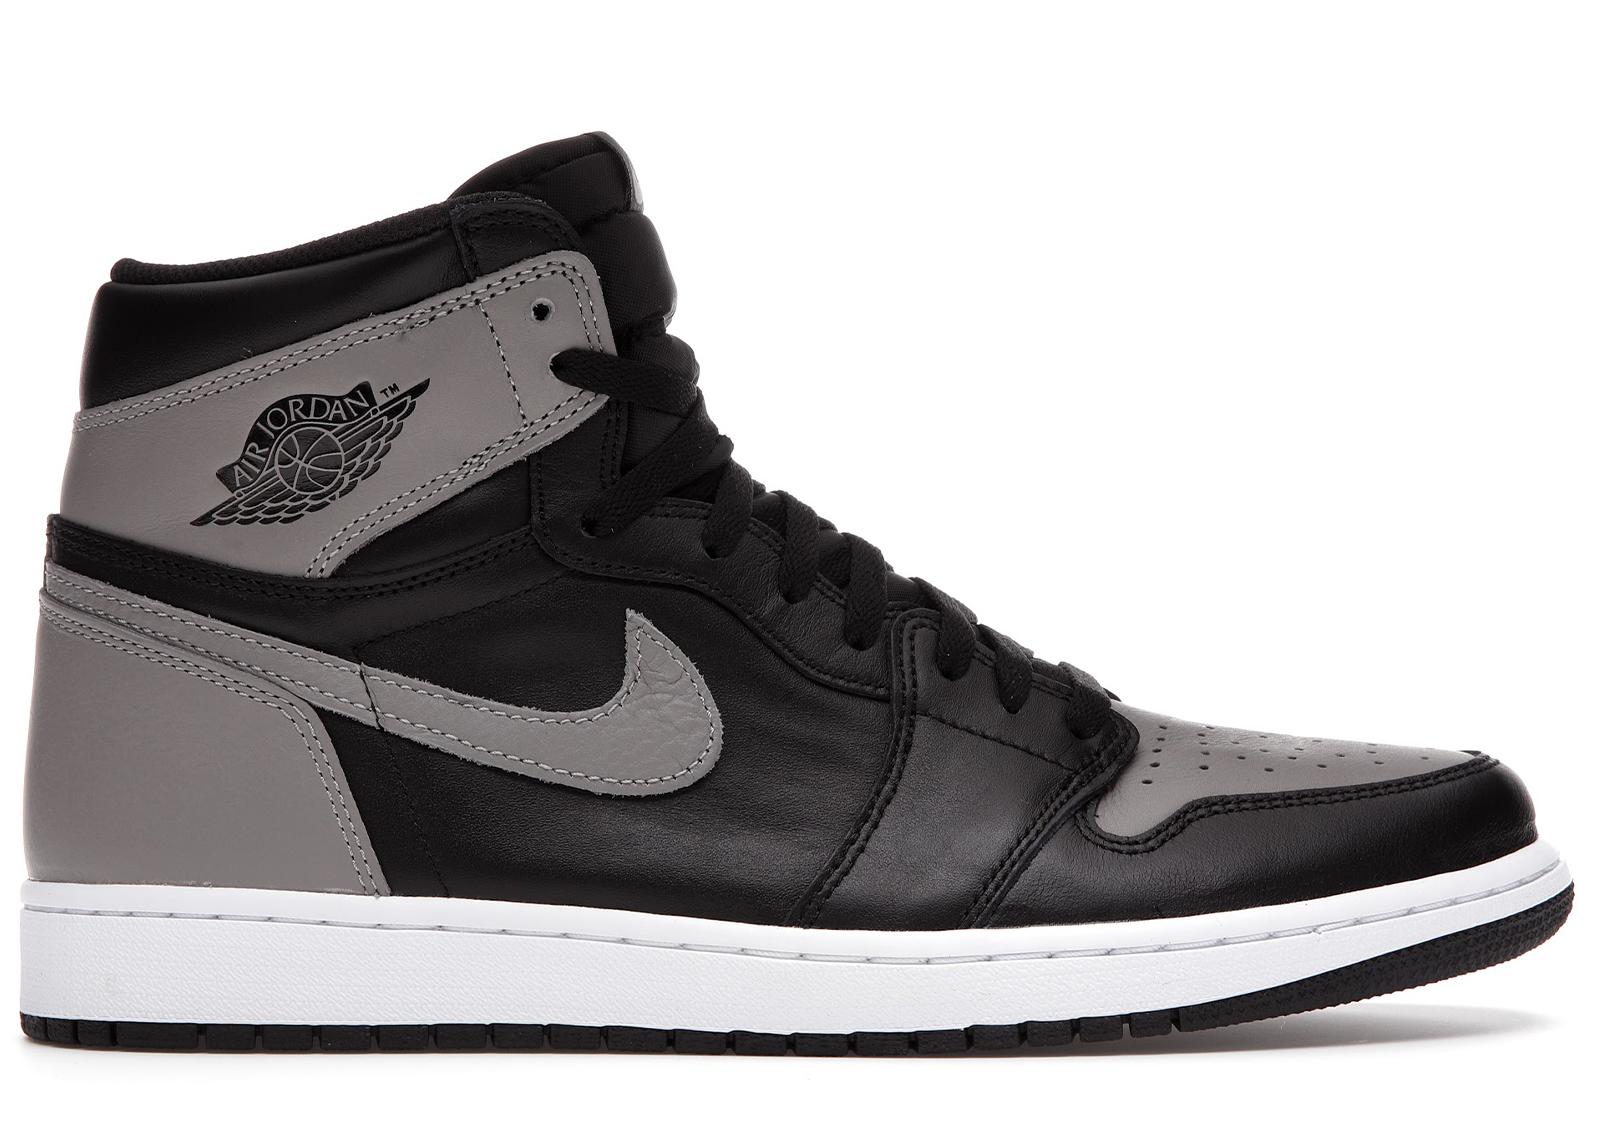 Buy Air Jordan 1 Shoes & Deadstock Sneakers